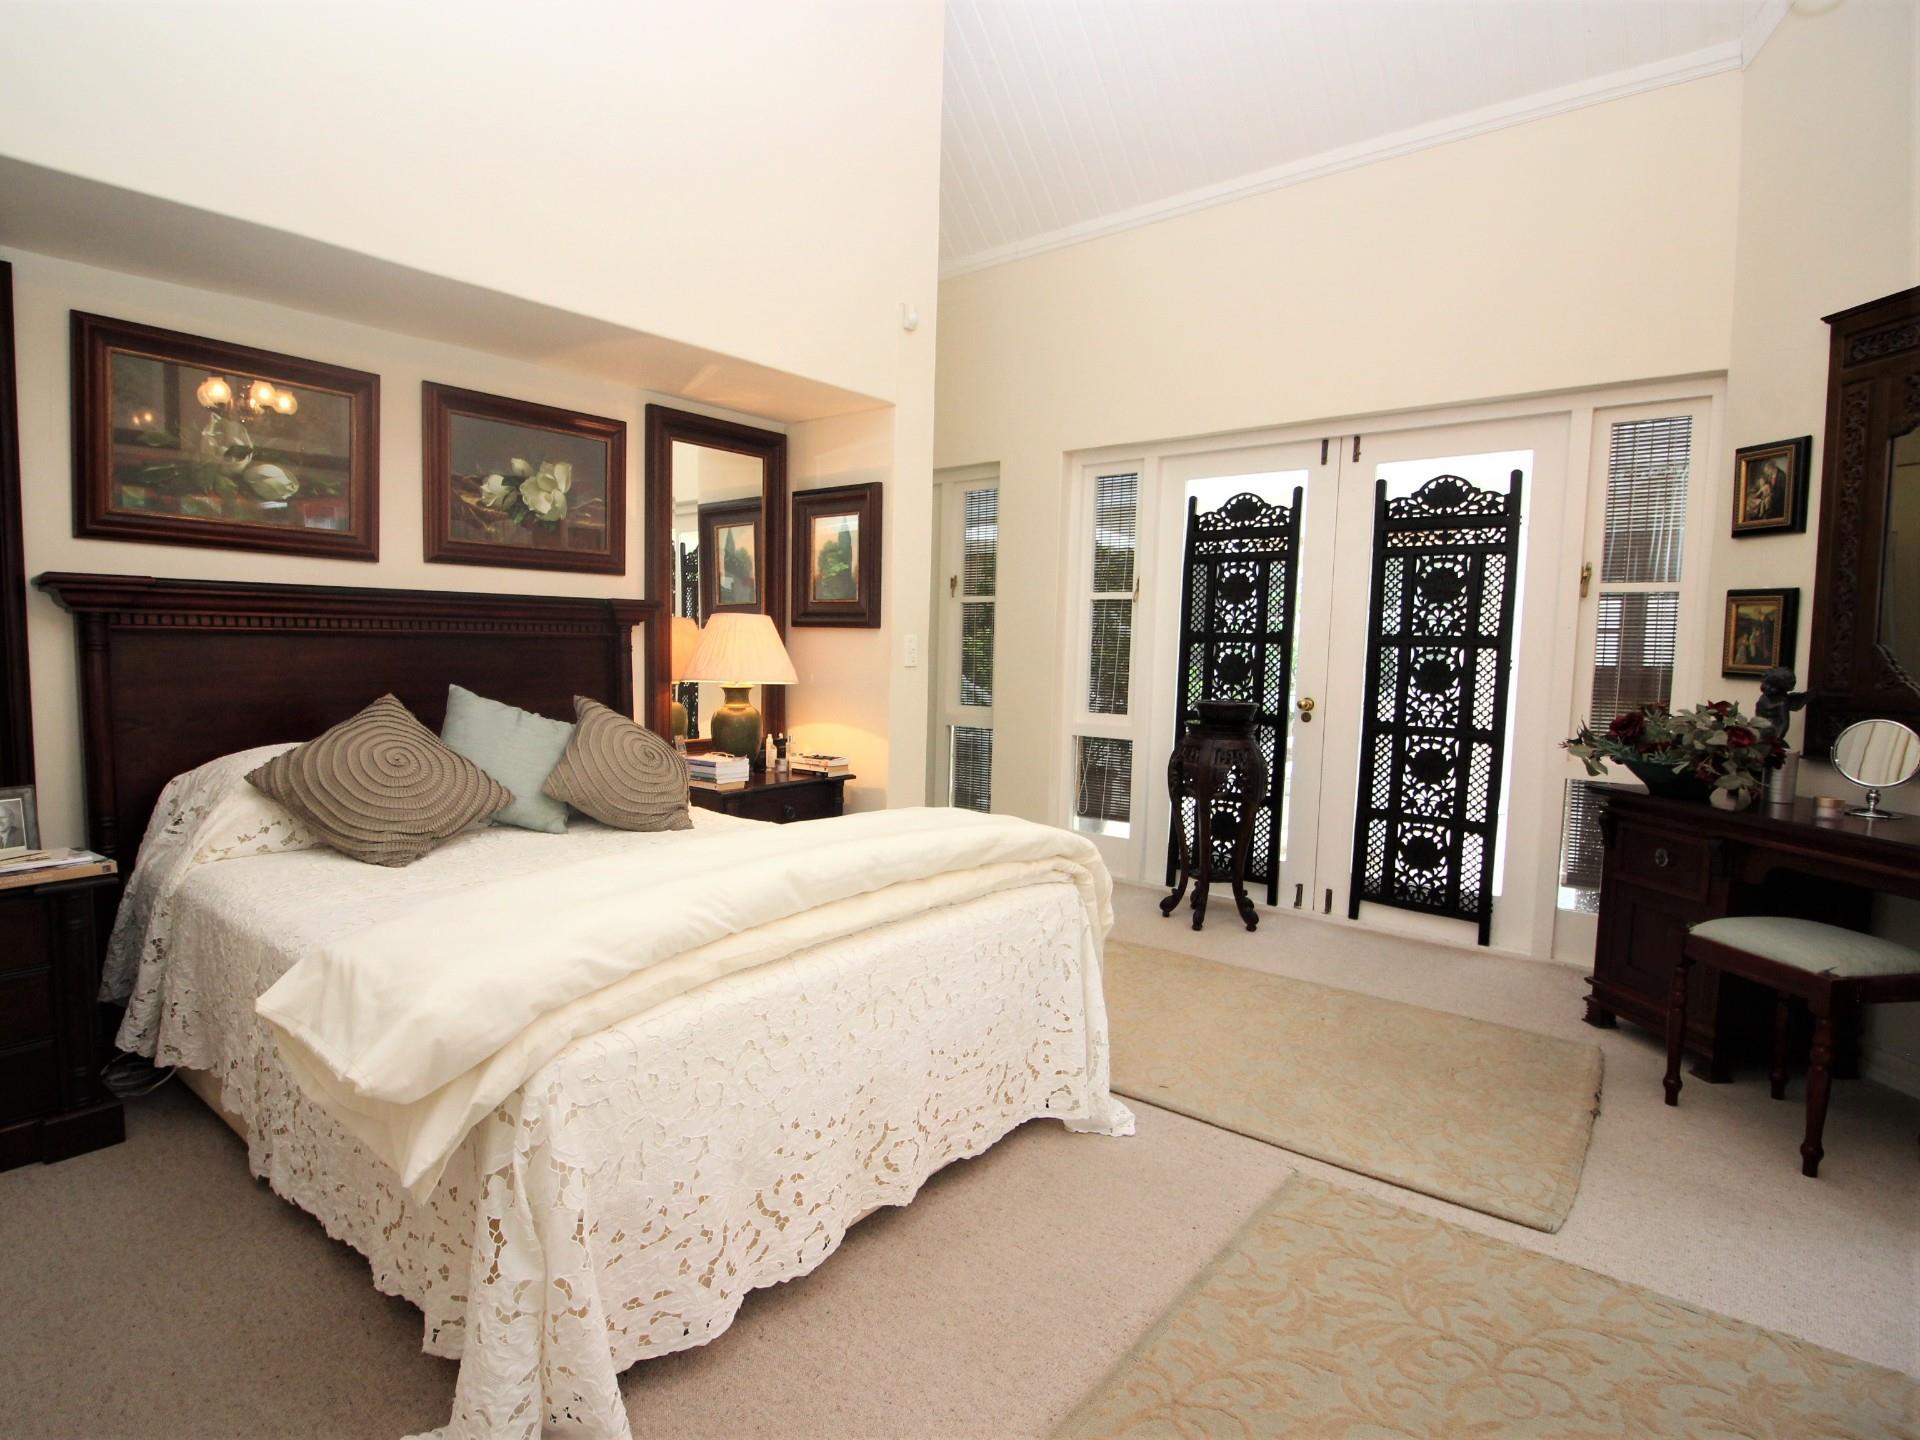 5 Bedroom House For Sale in Belvidere Estate